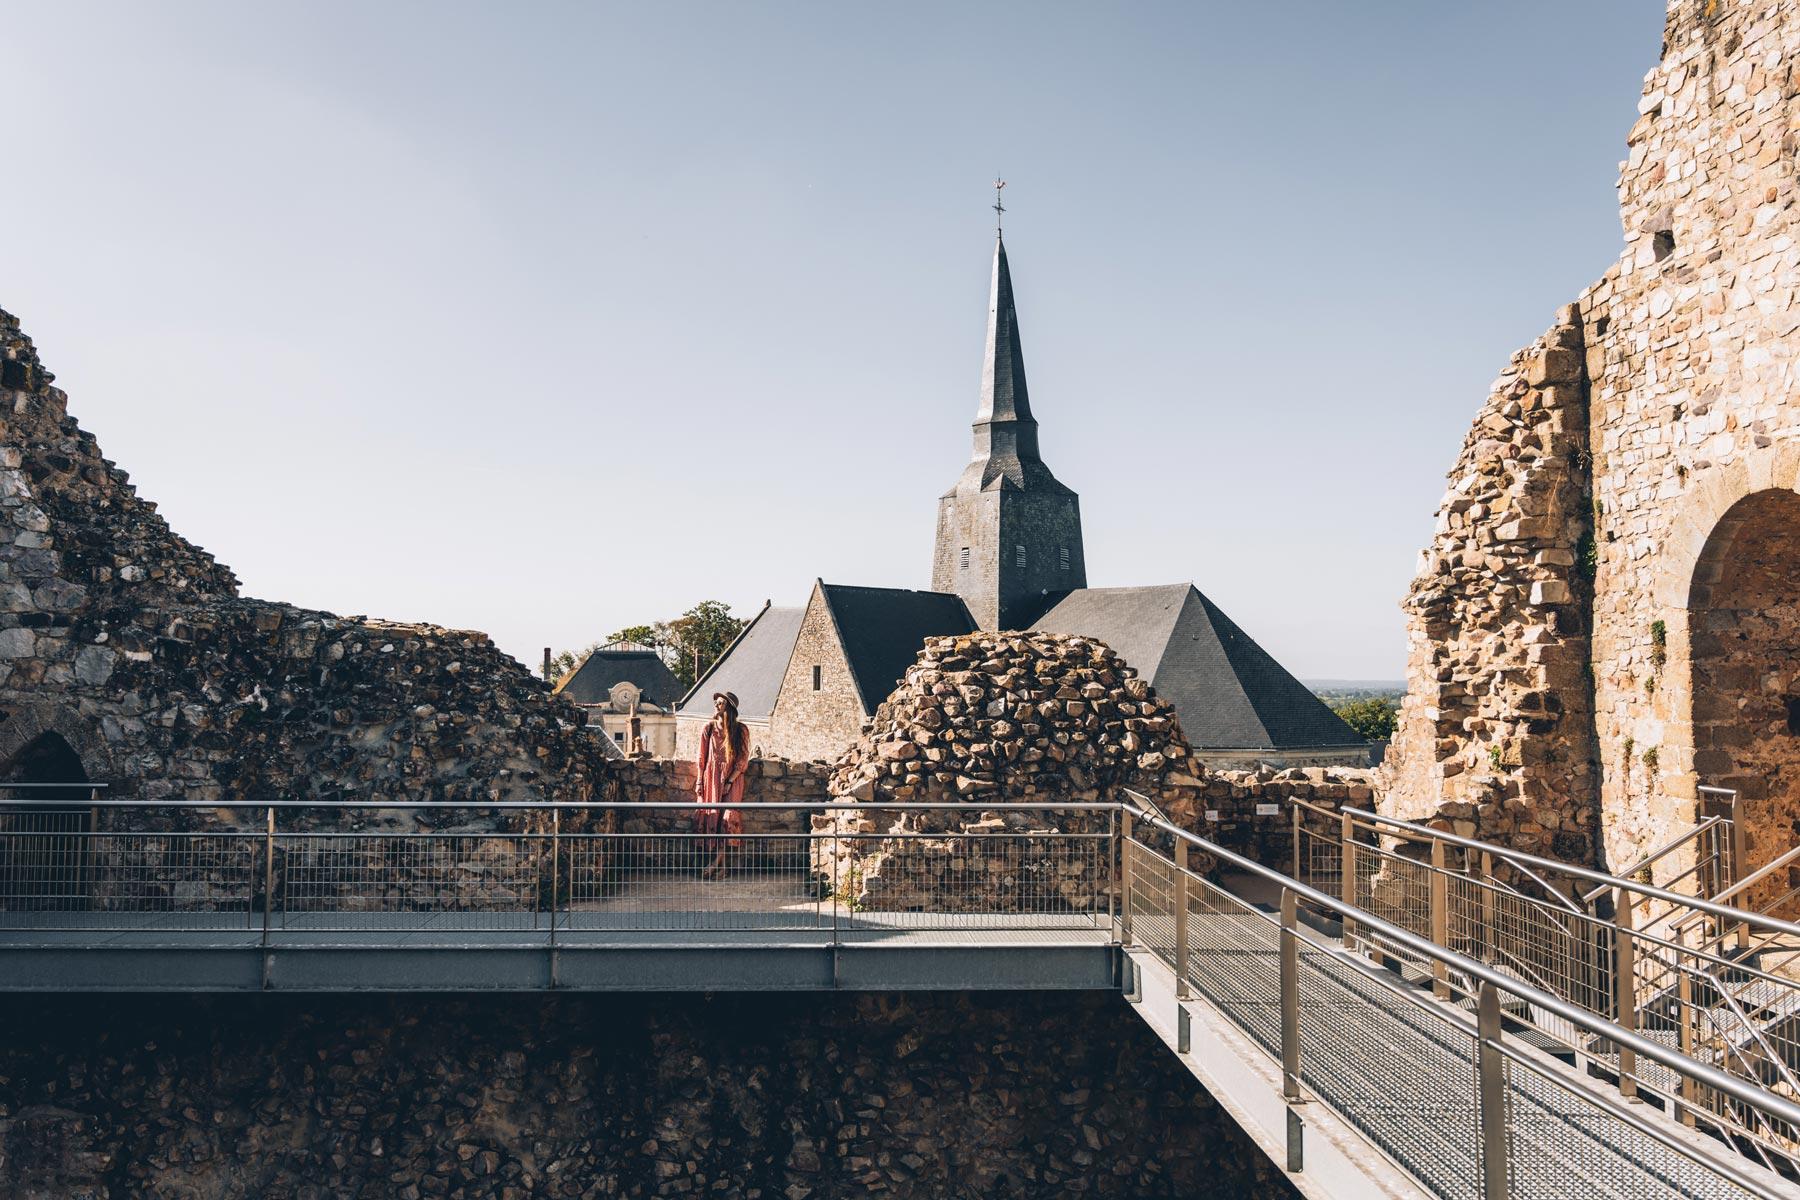 Château Sainte Suzanne, Mayenne